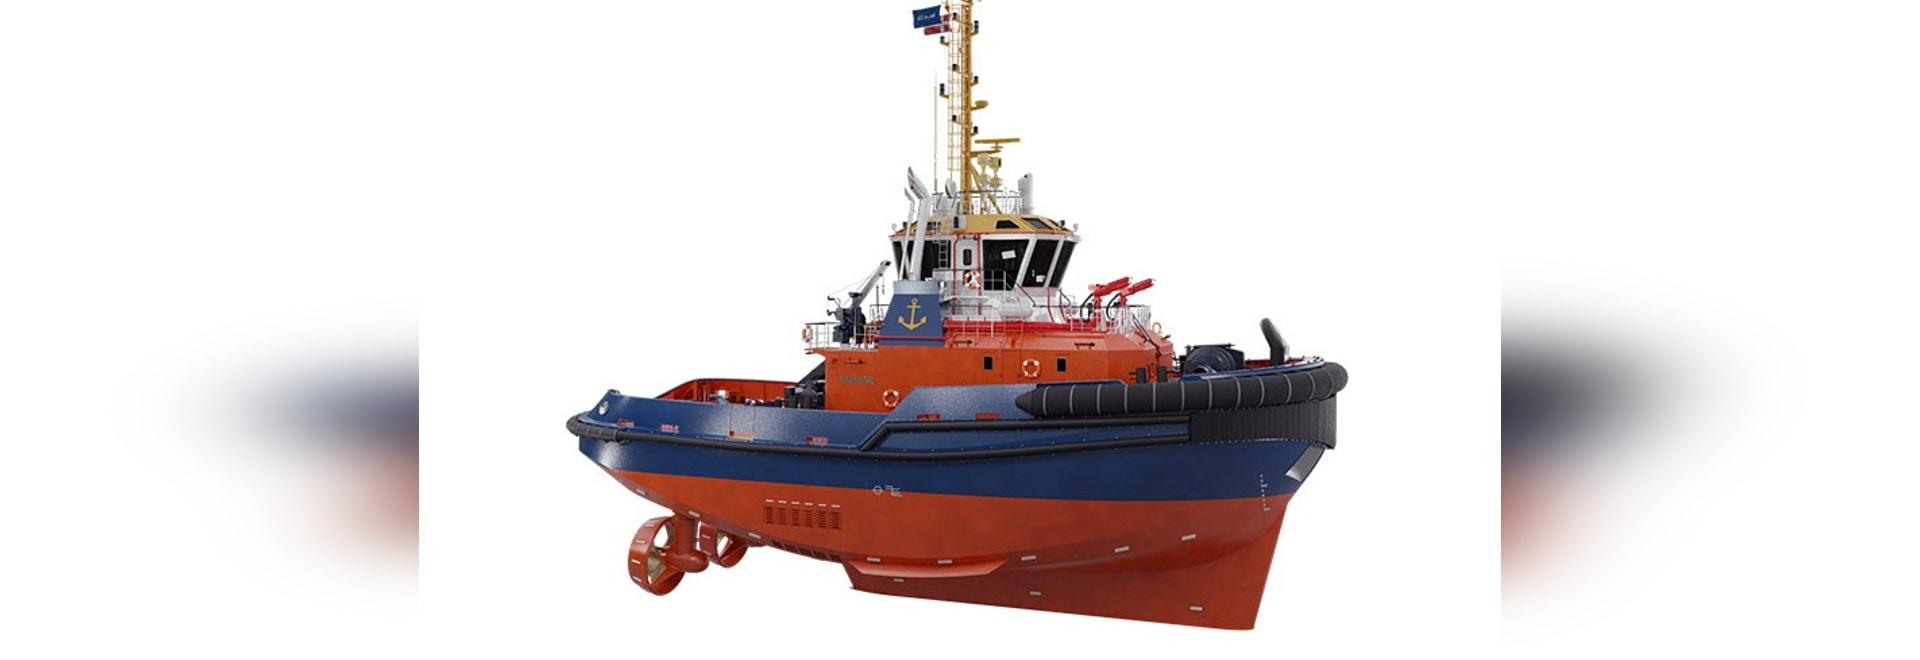 Tug is on order at Turkey's Uzmar Shipyard for Port of Aarhus, Denmark